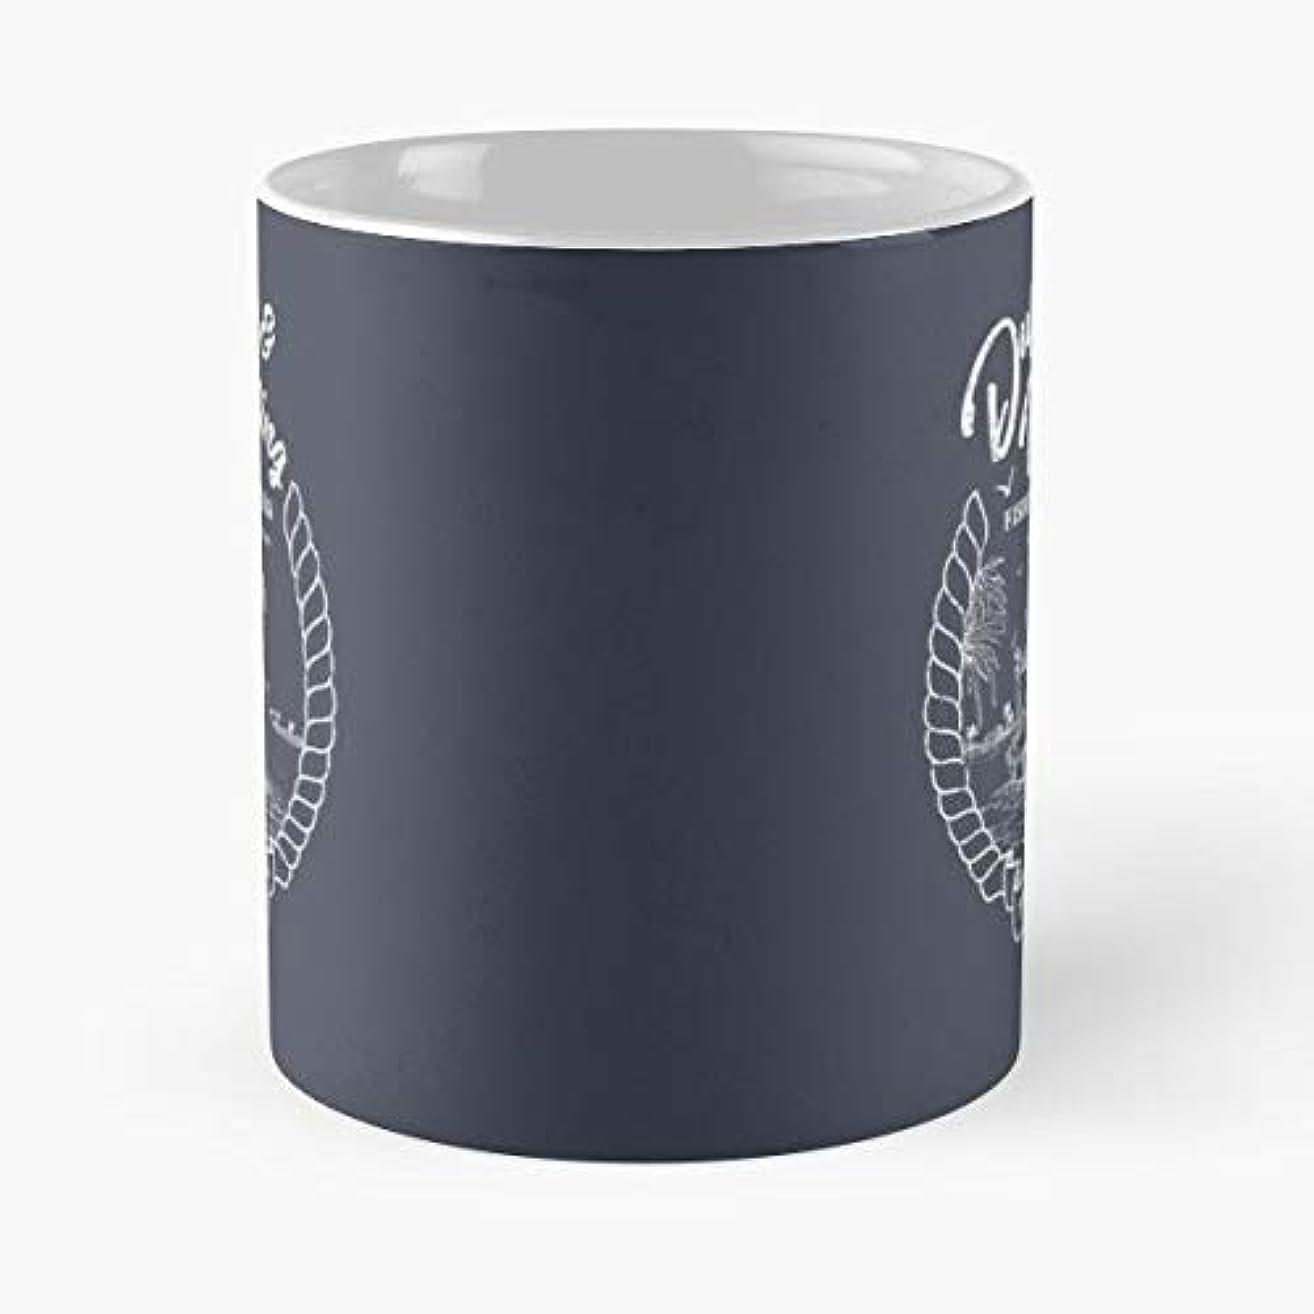 Andy Dufresne Redding Shawshank Redemption - Coffee Mugs,handmade Funny 11oz Mug Best Holidays Gifts For Men Women Friends.